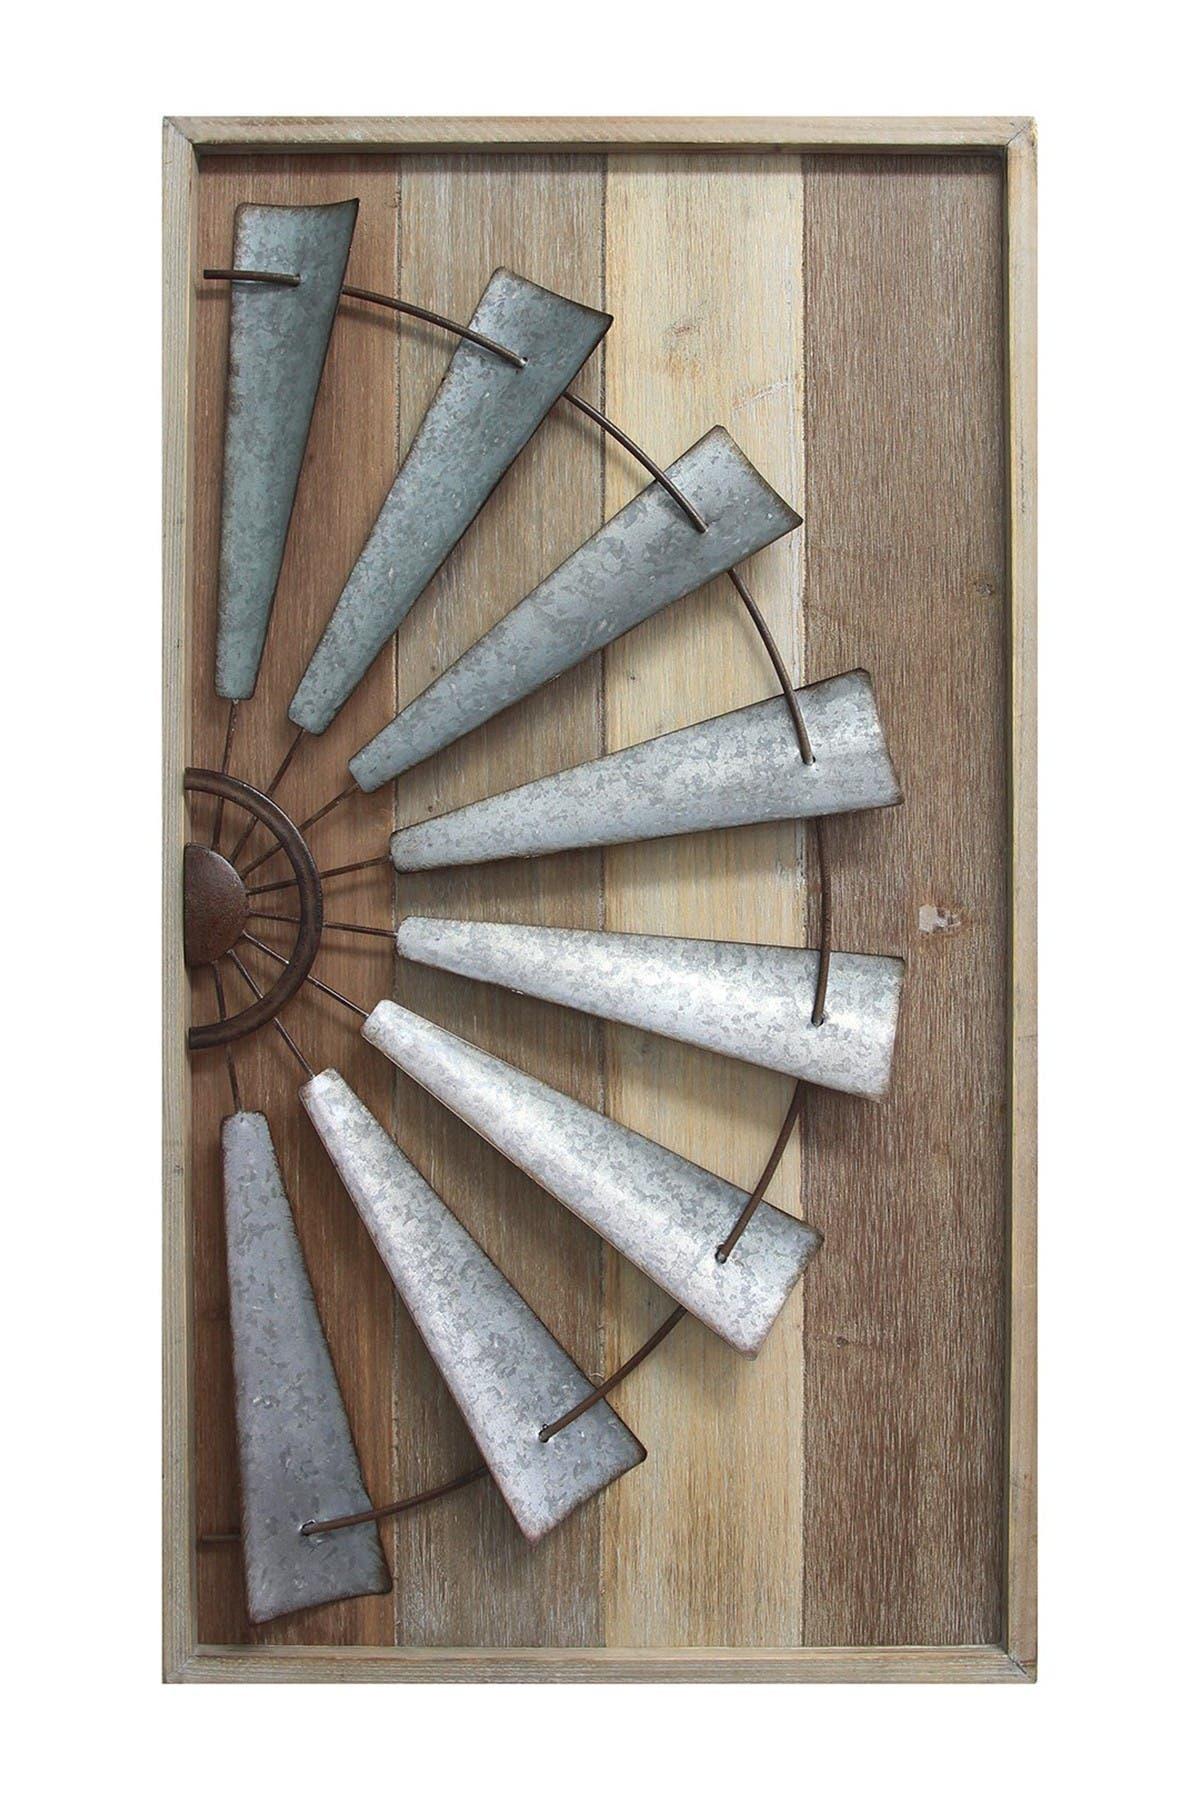 Image of Stratton Home Multi Windmill Wall Decor